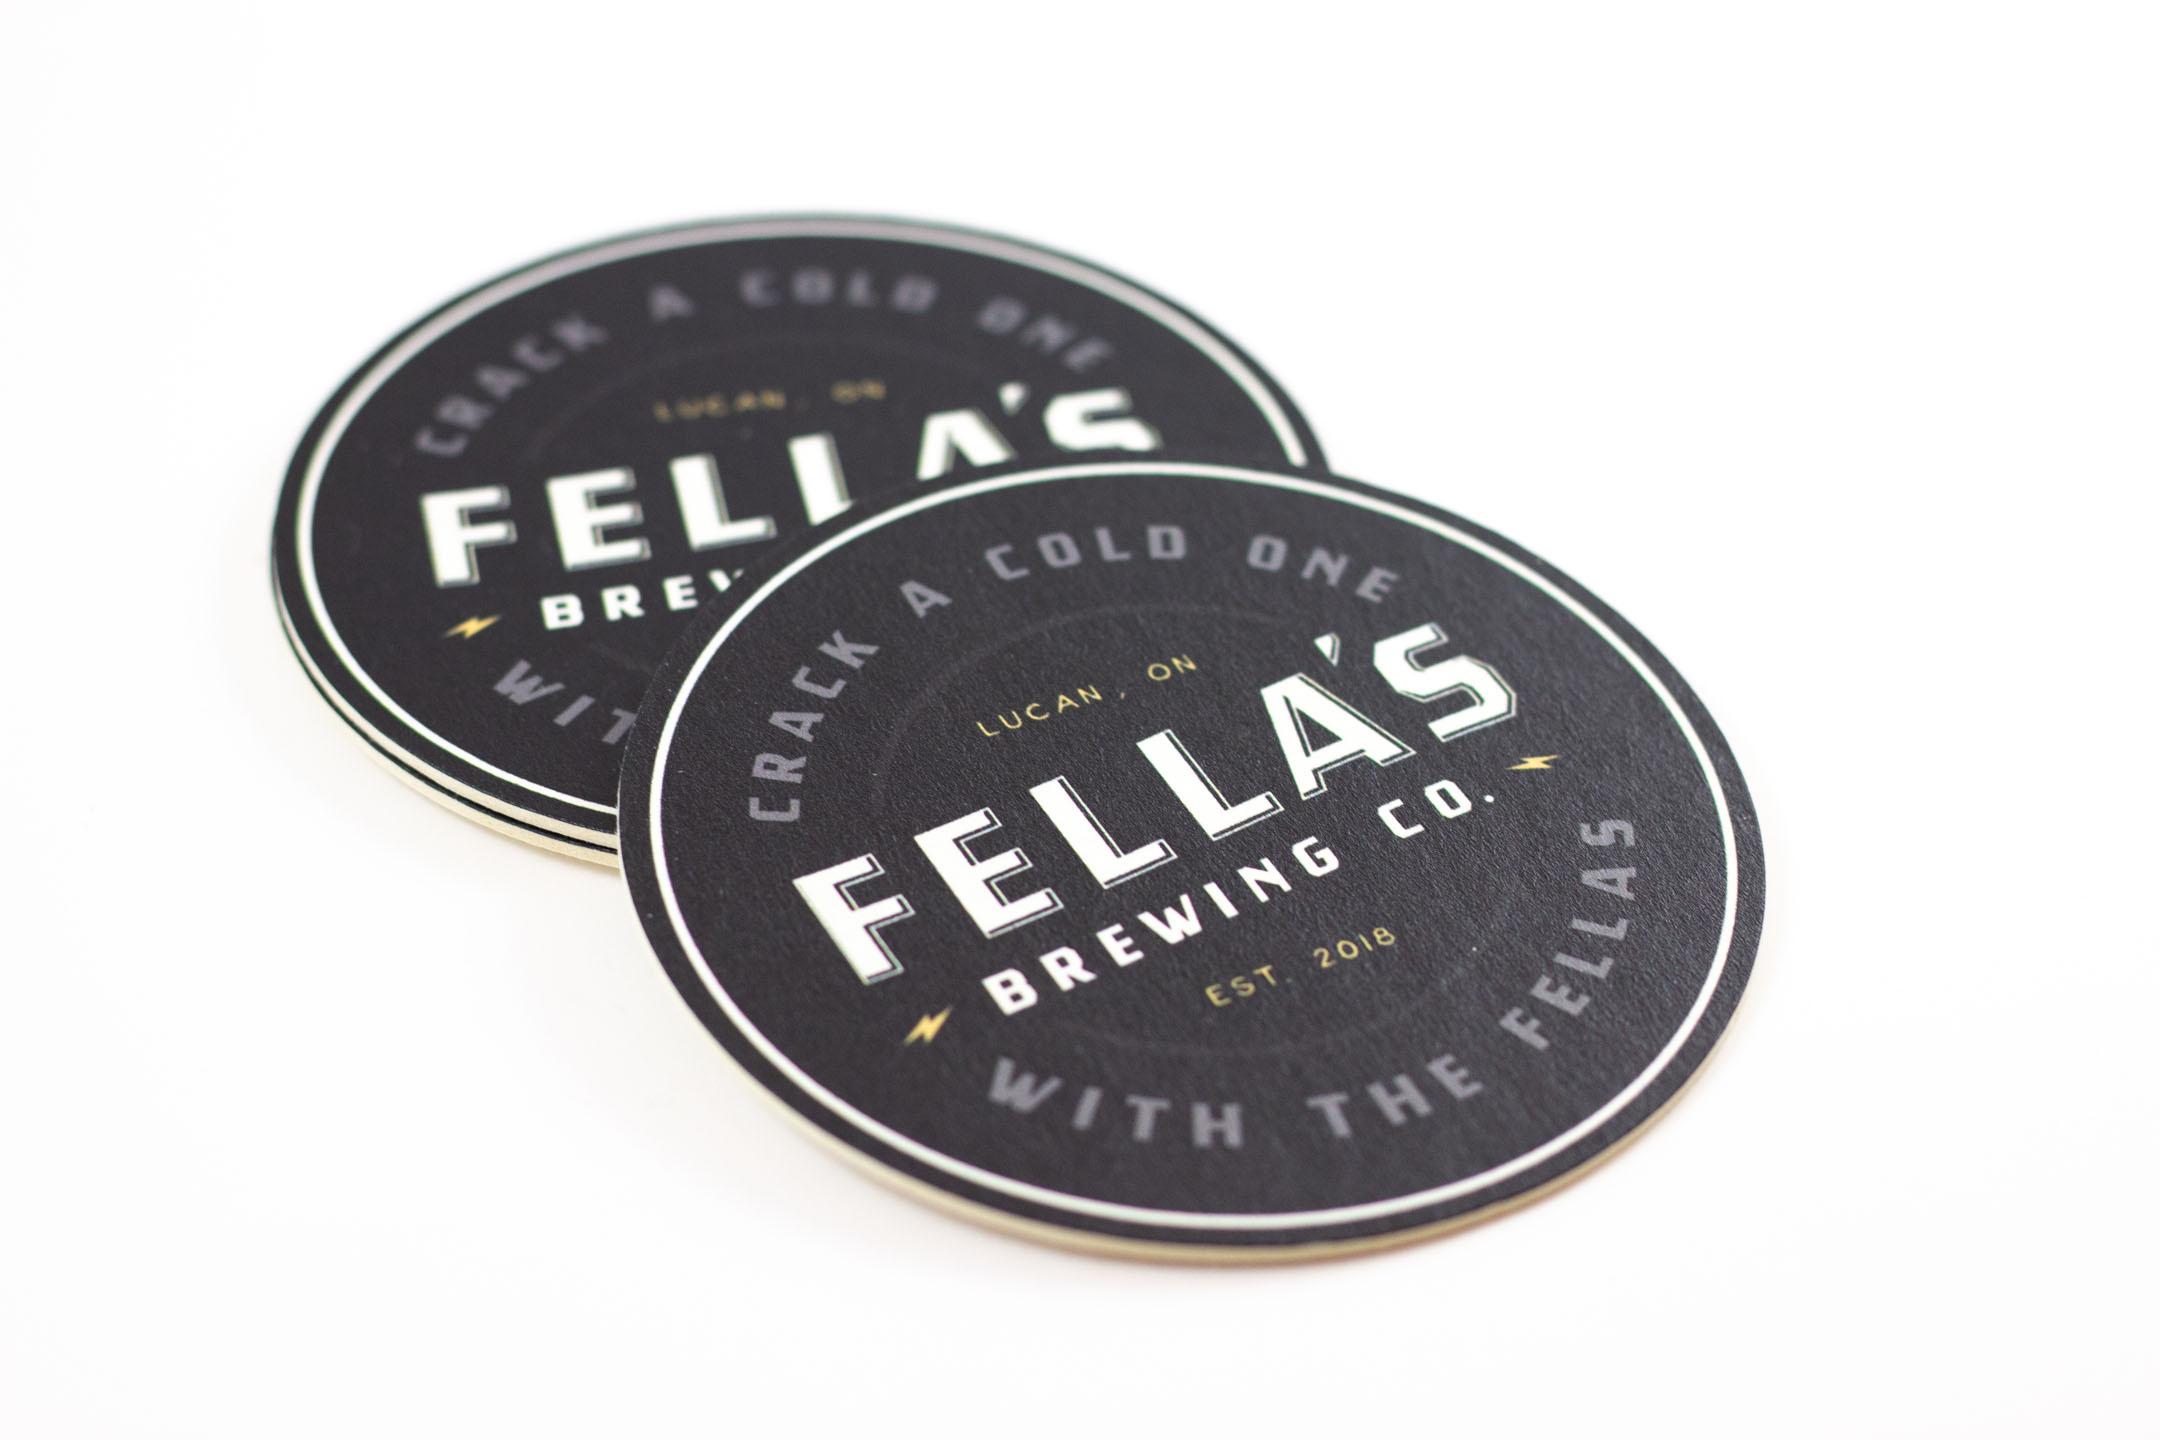 Stickers-1-35.jpg